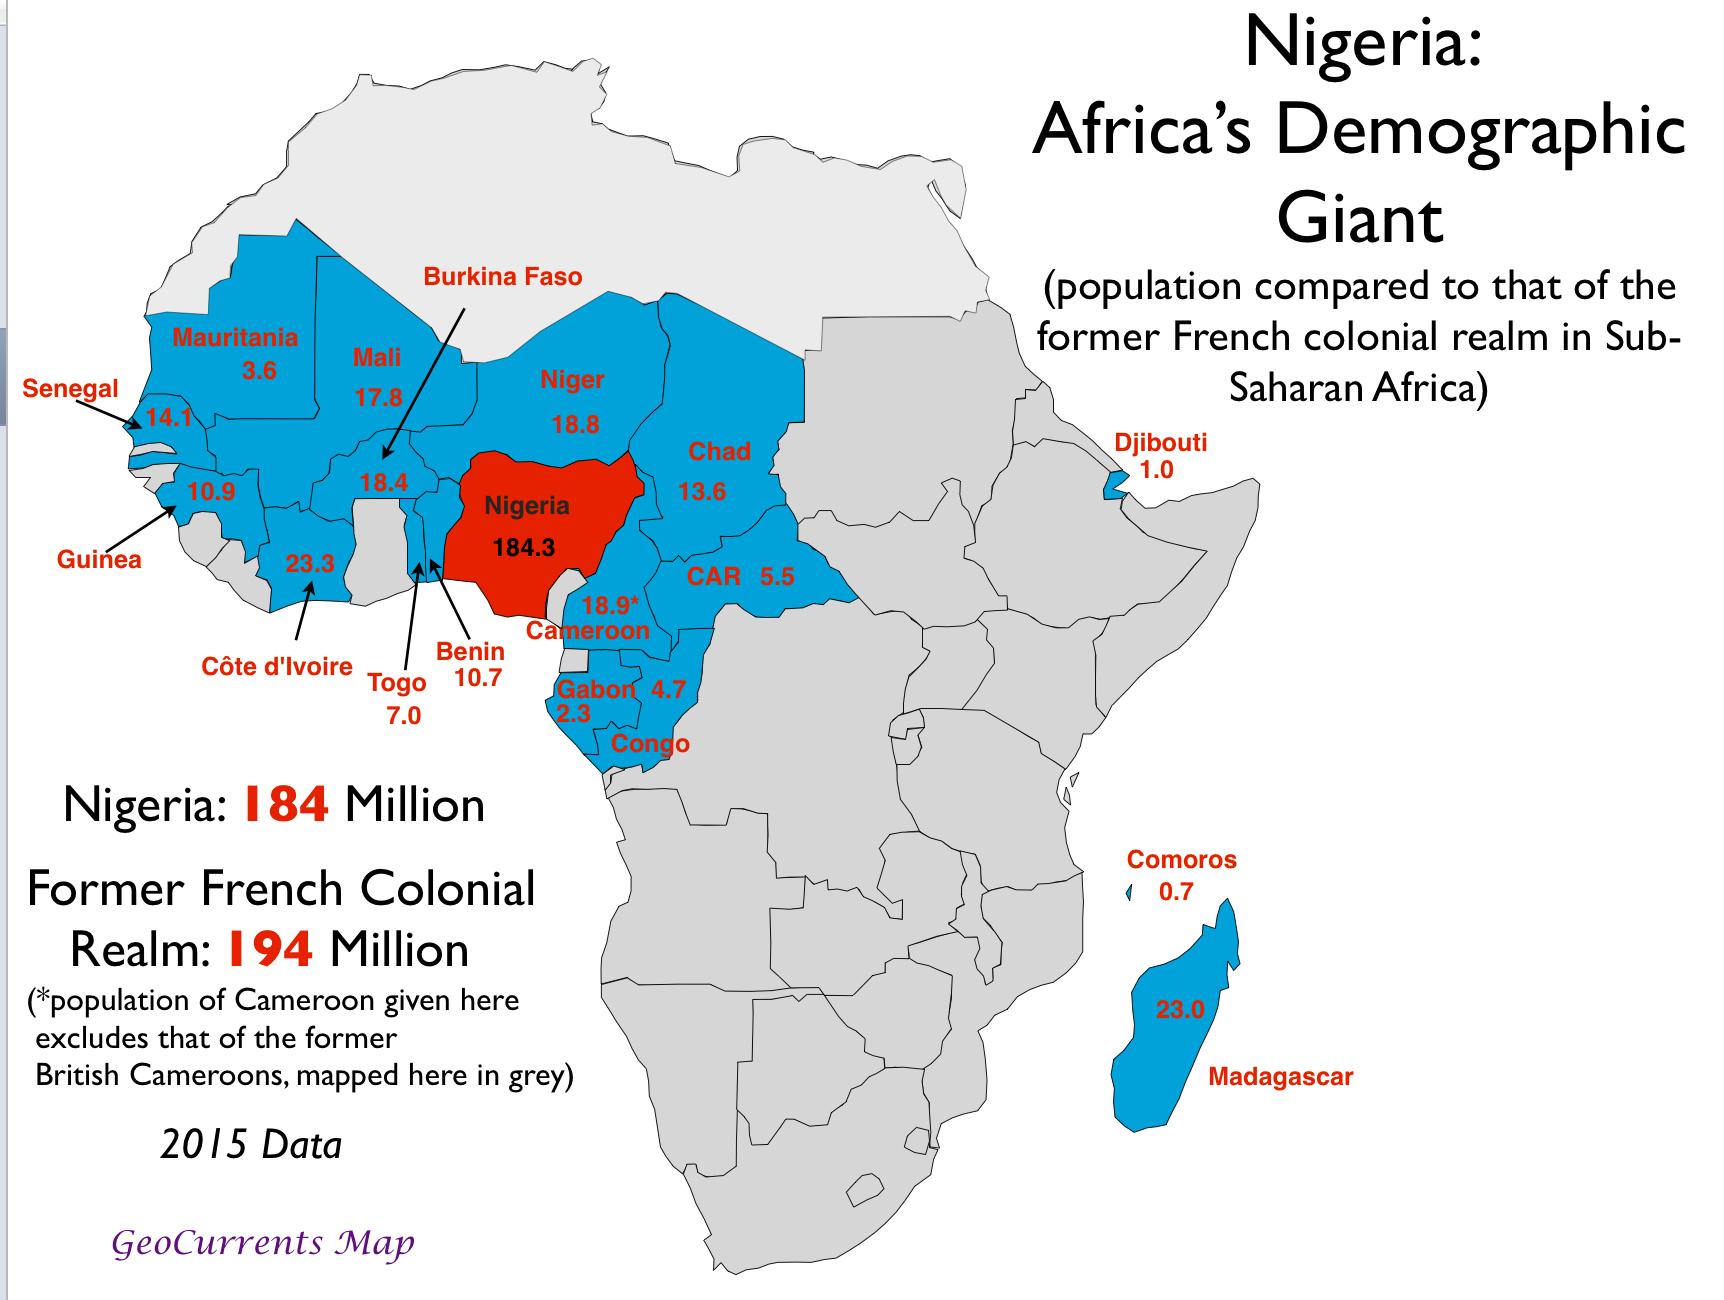 Demographics of Nigeria